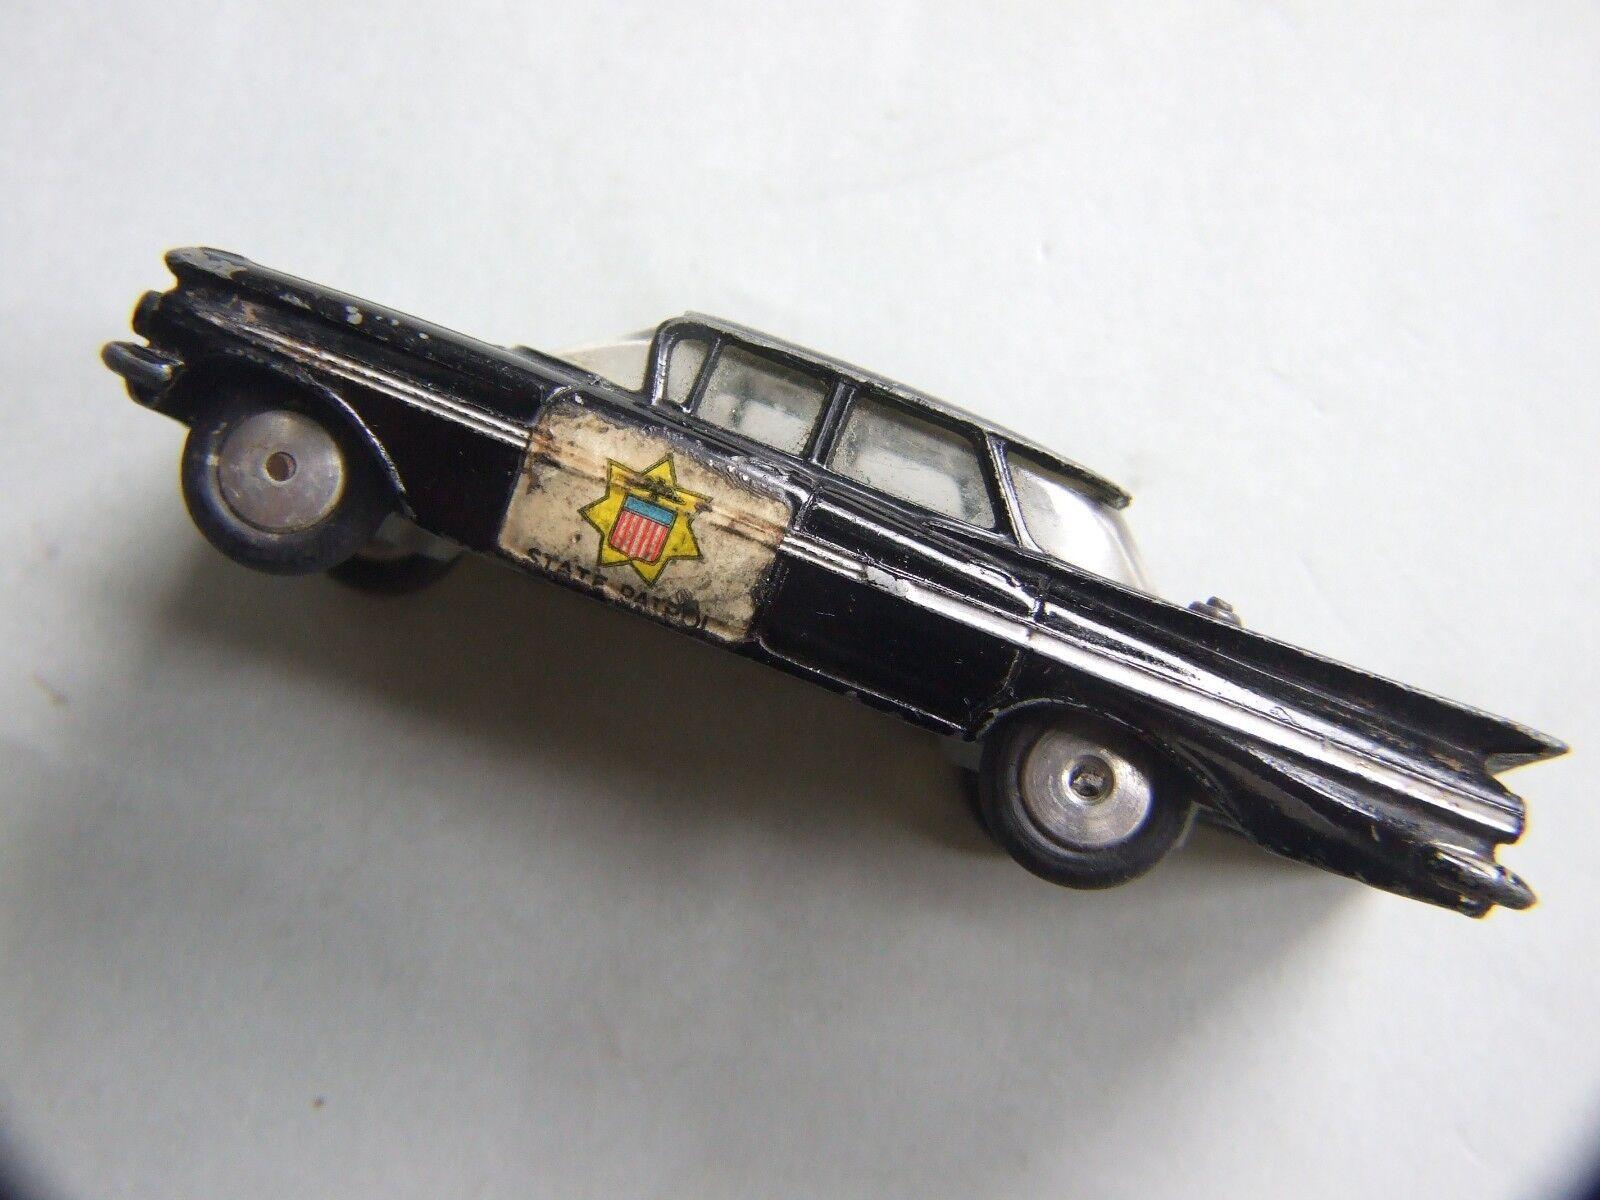 Vintage Corgi Toys Chevrolet Impala  Car  Model  Made in Gt .Britain